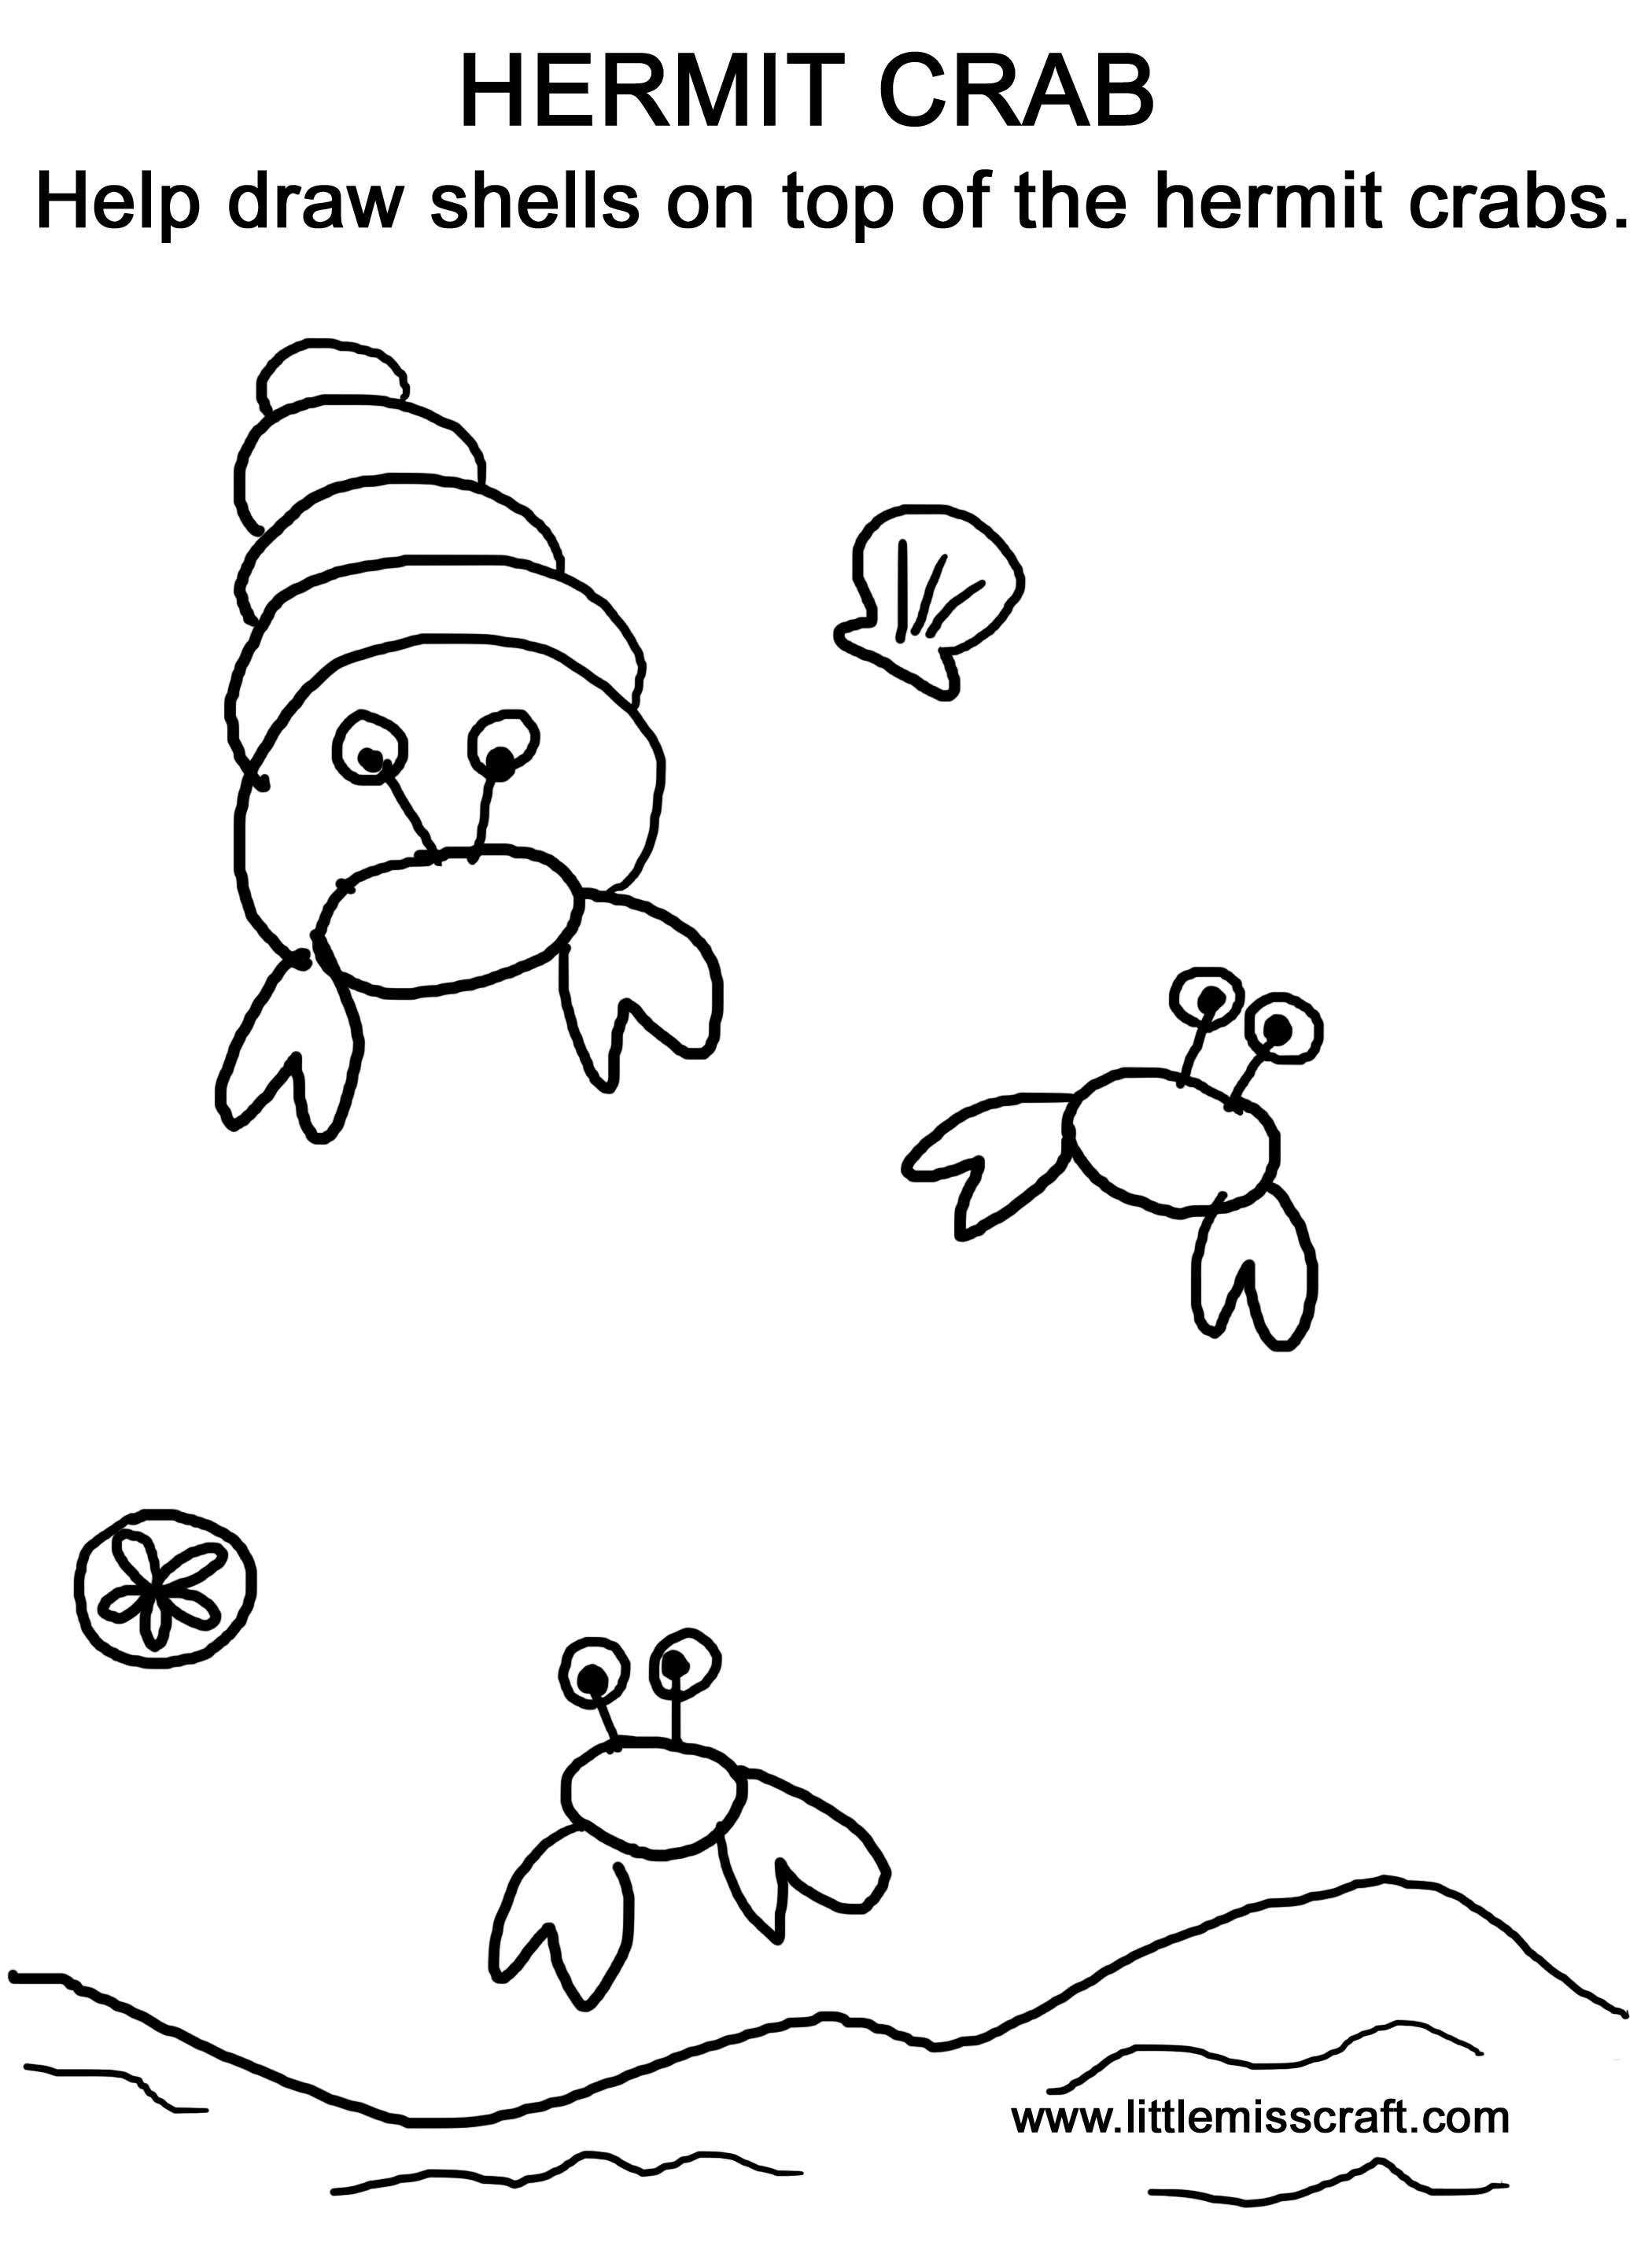 Hermit Crab Drawing At Getdrawings